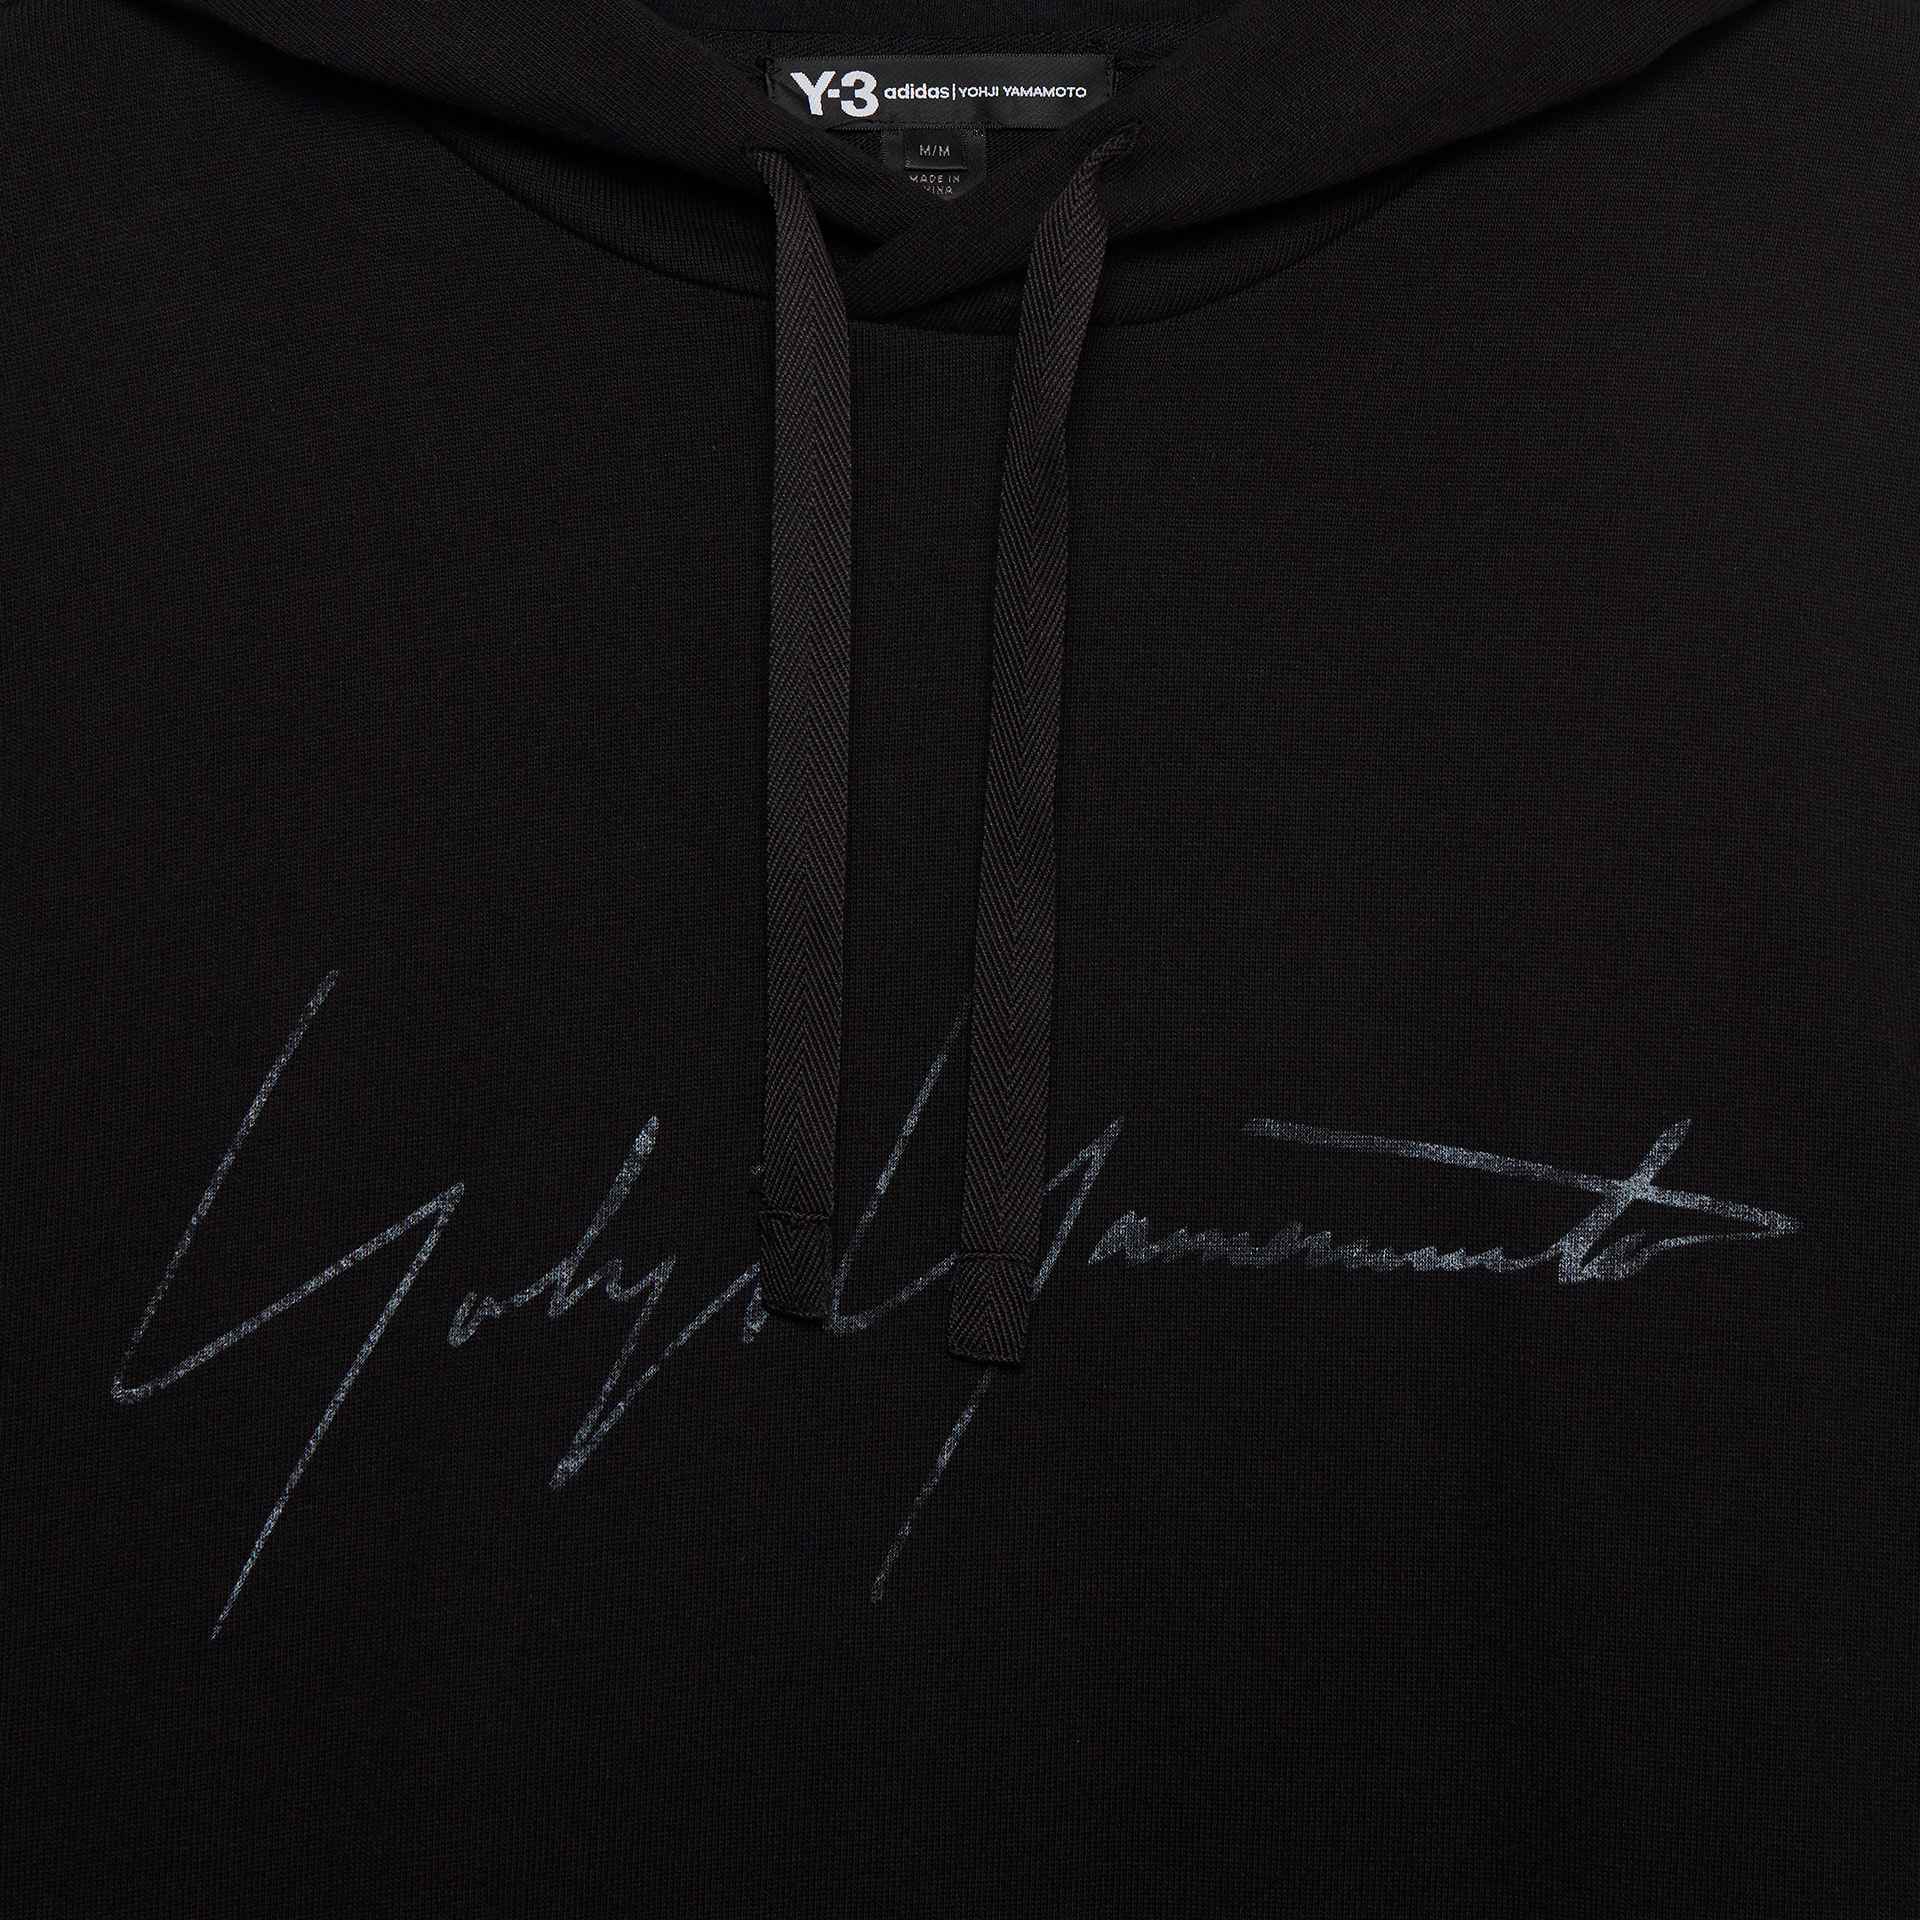 close up detail of a black sweat jumper